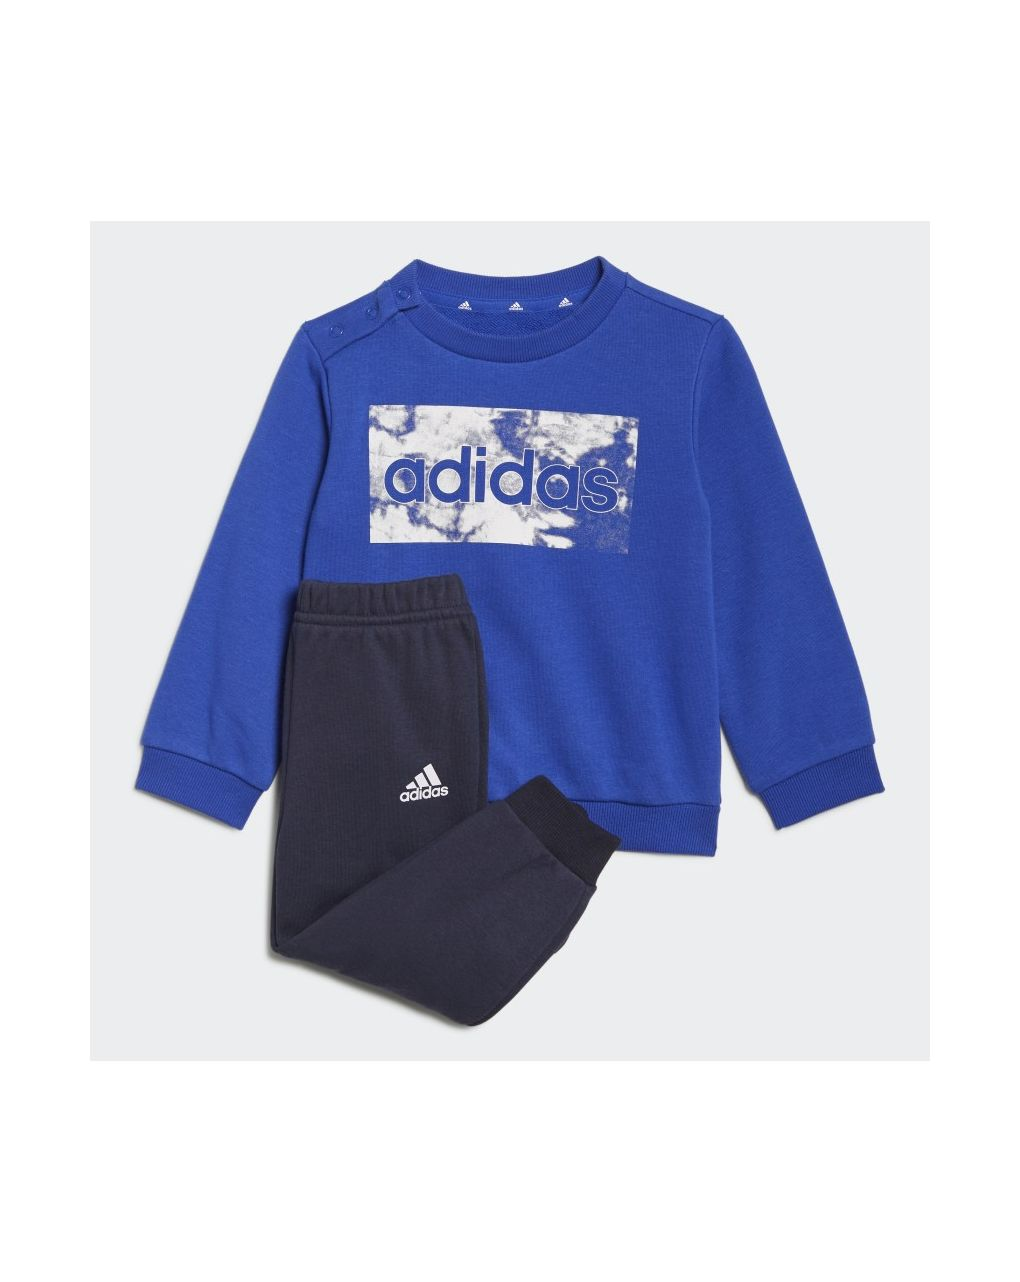 Adidas Σετ Φόρμας Essentials Μπλε για Αγόρι GS4280